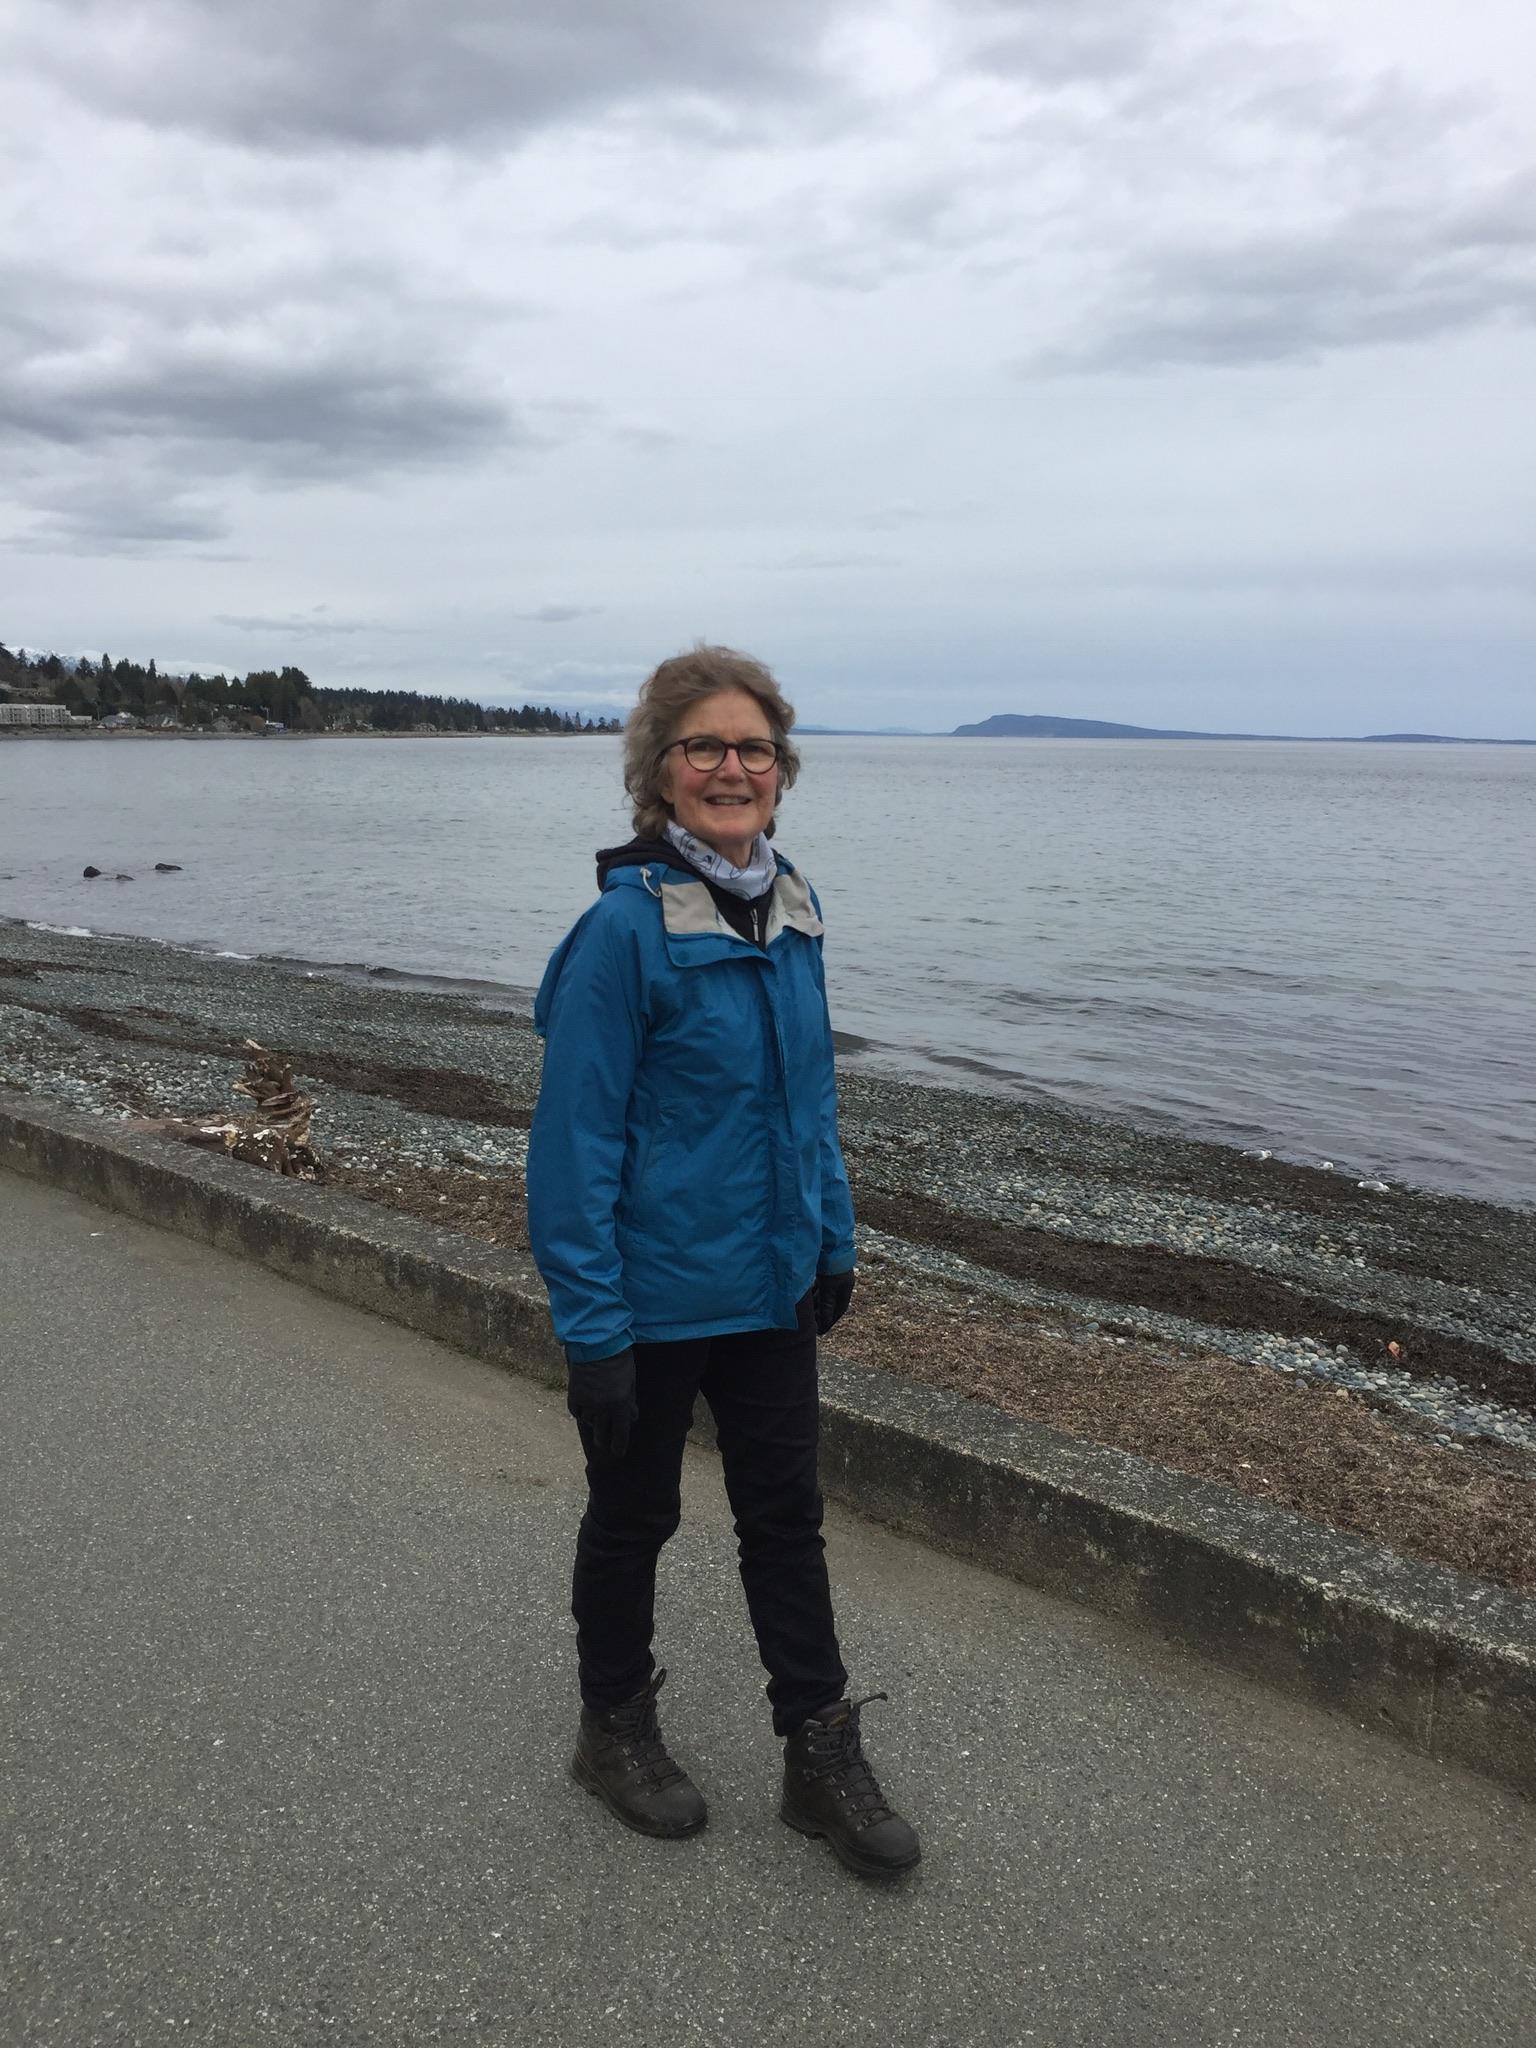 Marsha Bergen finds hope and healing in daily walking, rain or shine